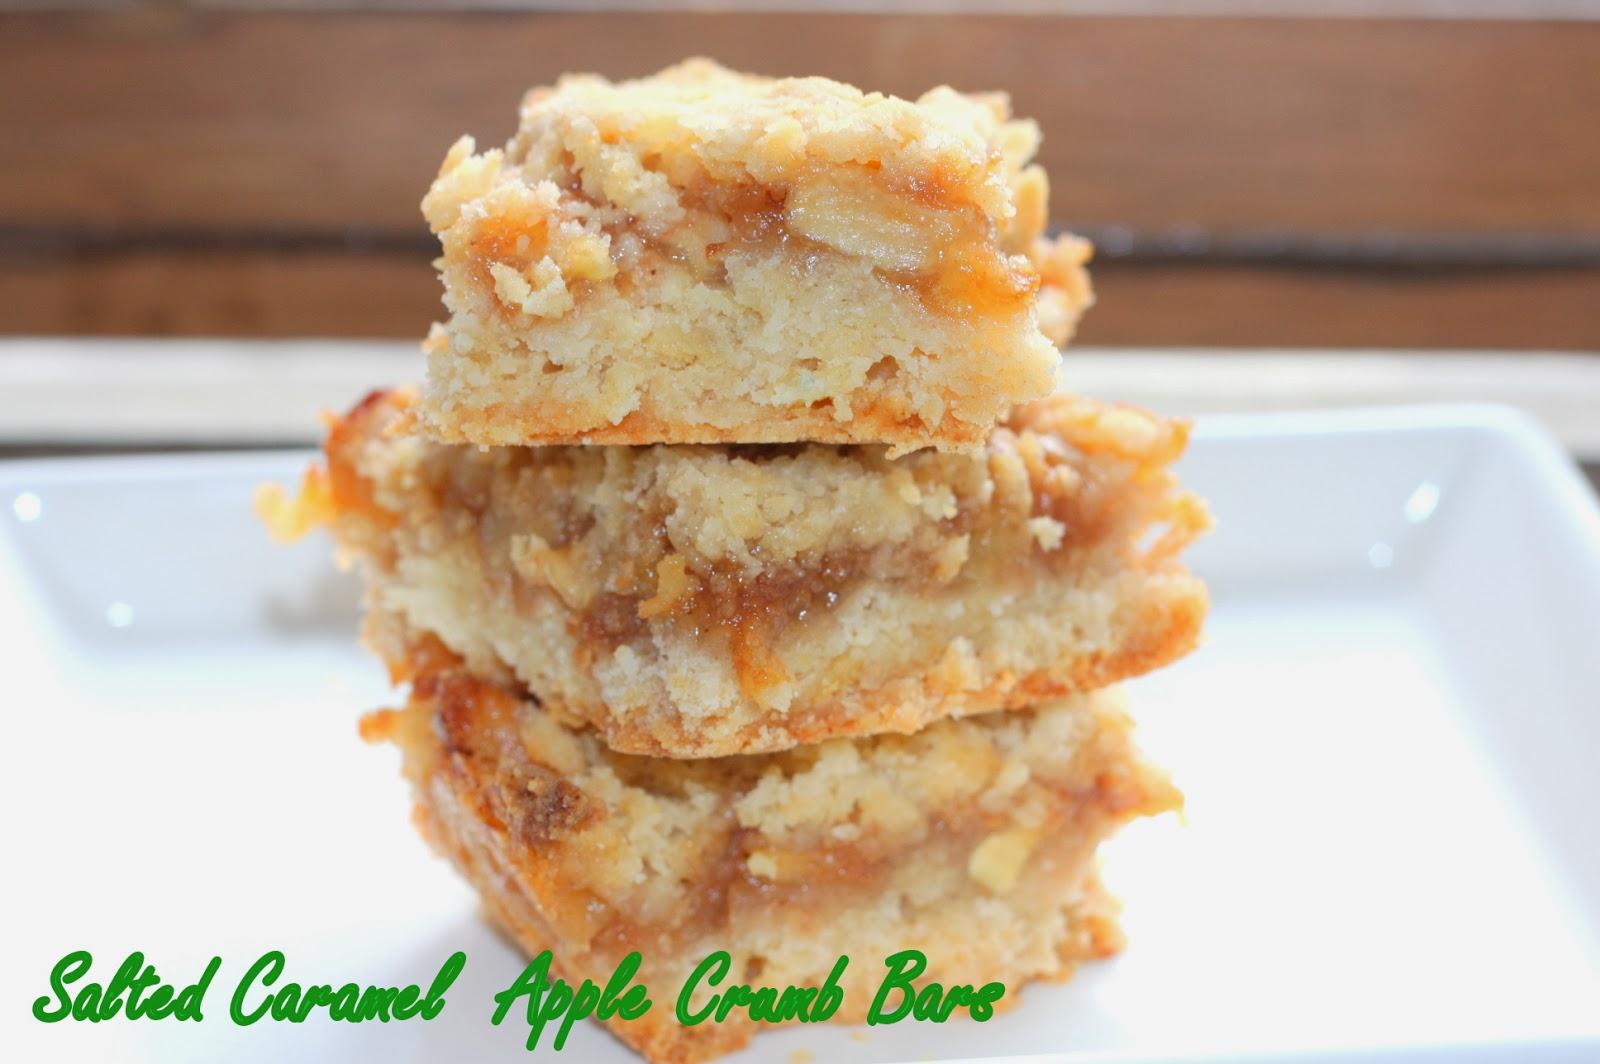 Boston Girl Bakes: Salted Caramel Apple Crumb Bars